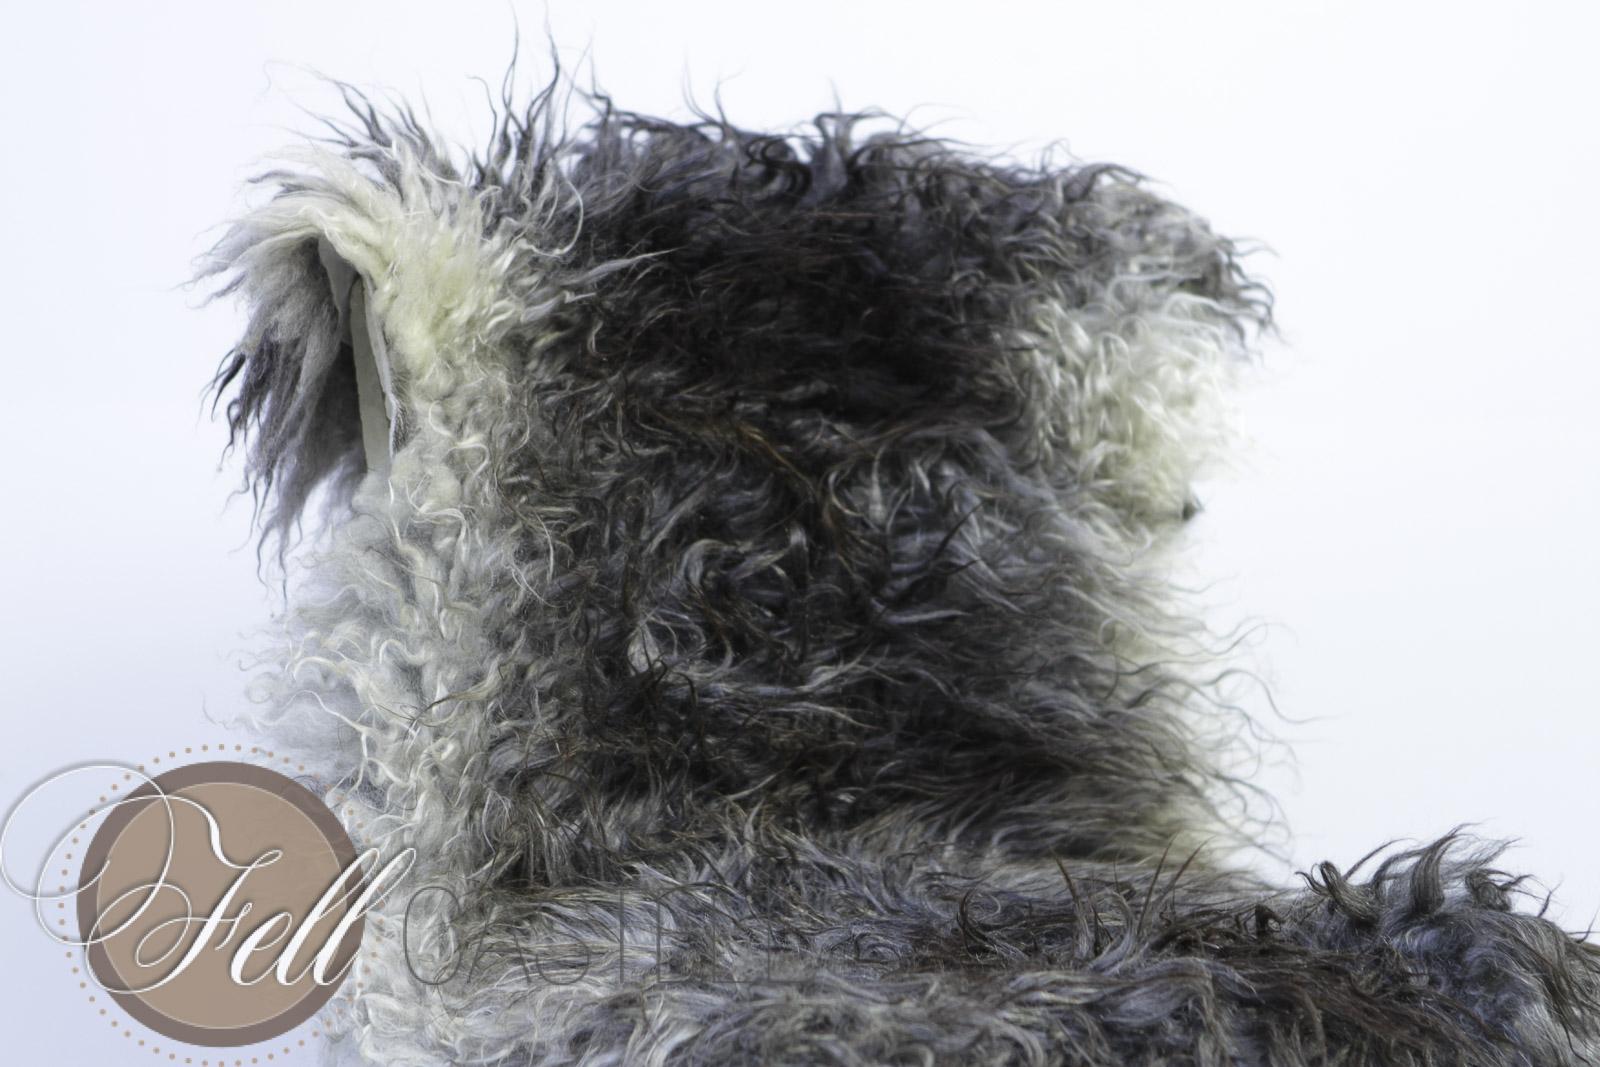 genuine swedish Gotland sheepskin